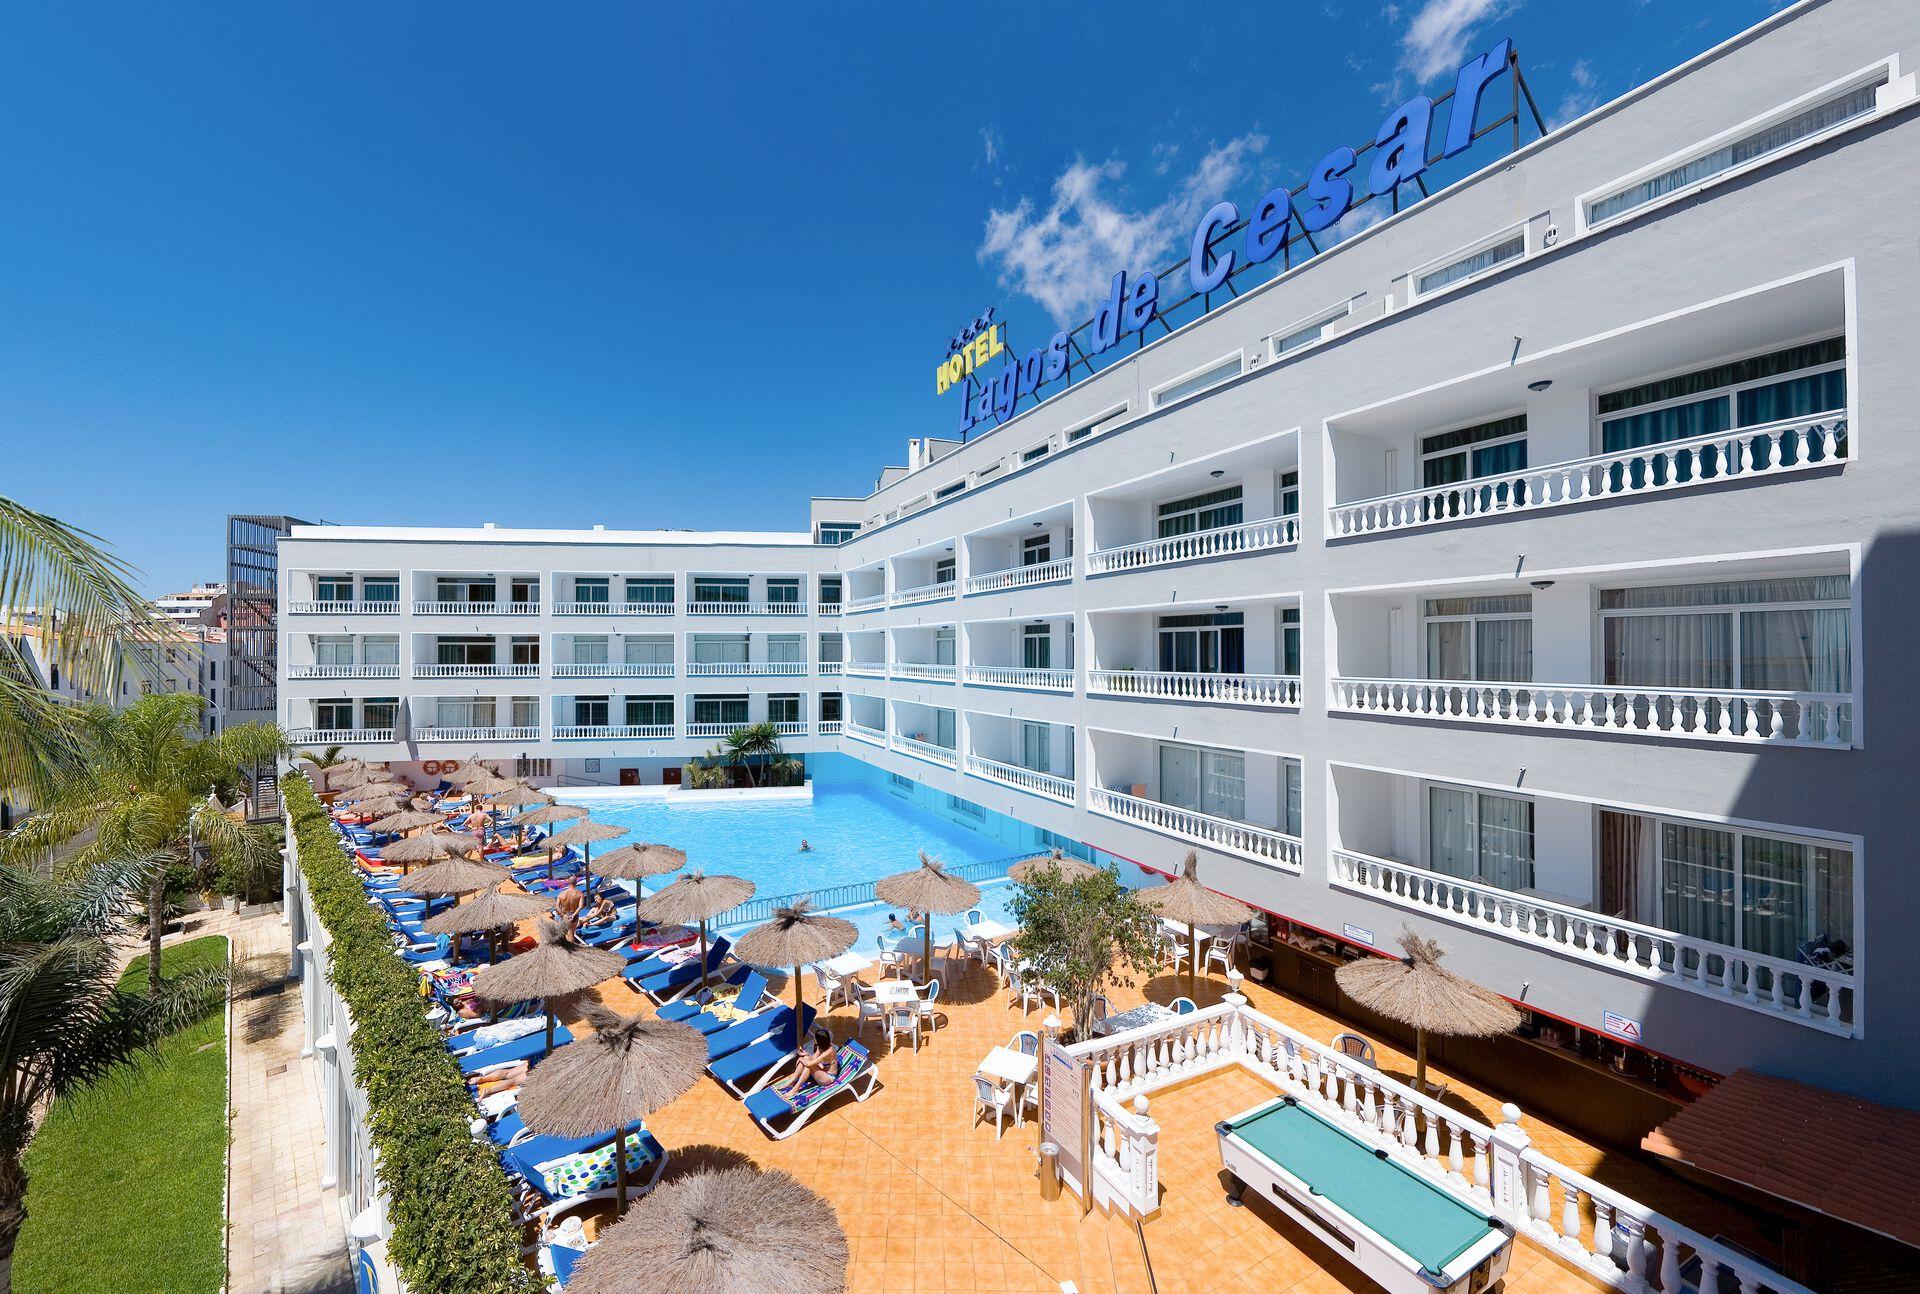 Hotel Blue Sea Lagos de Cesar - 4*